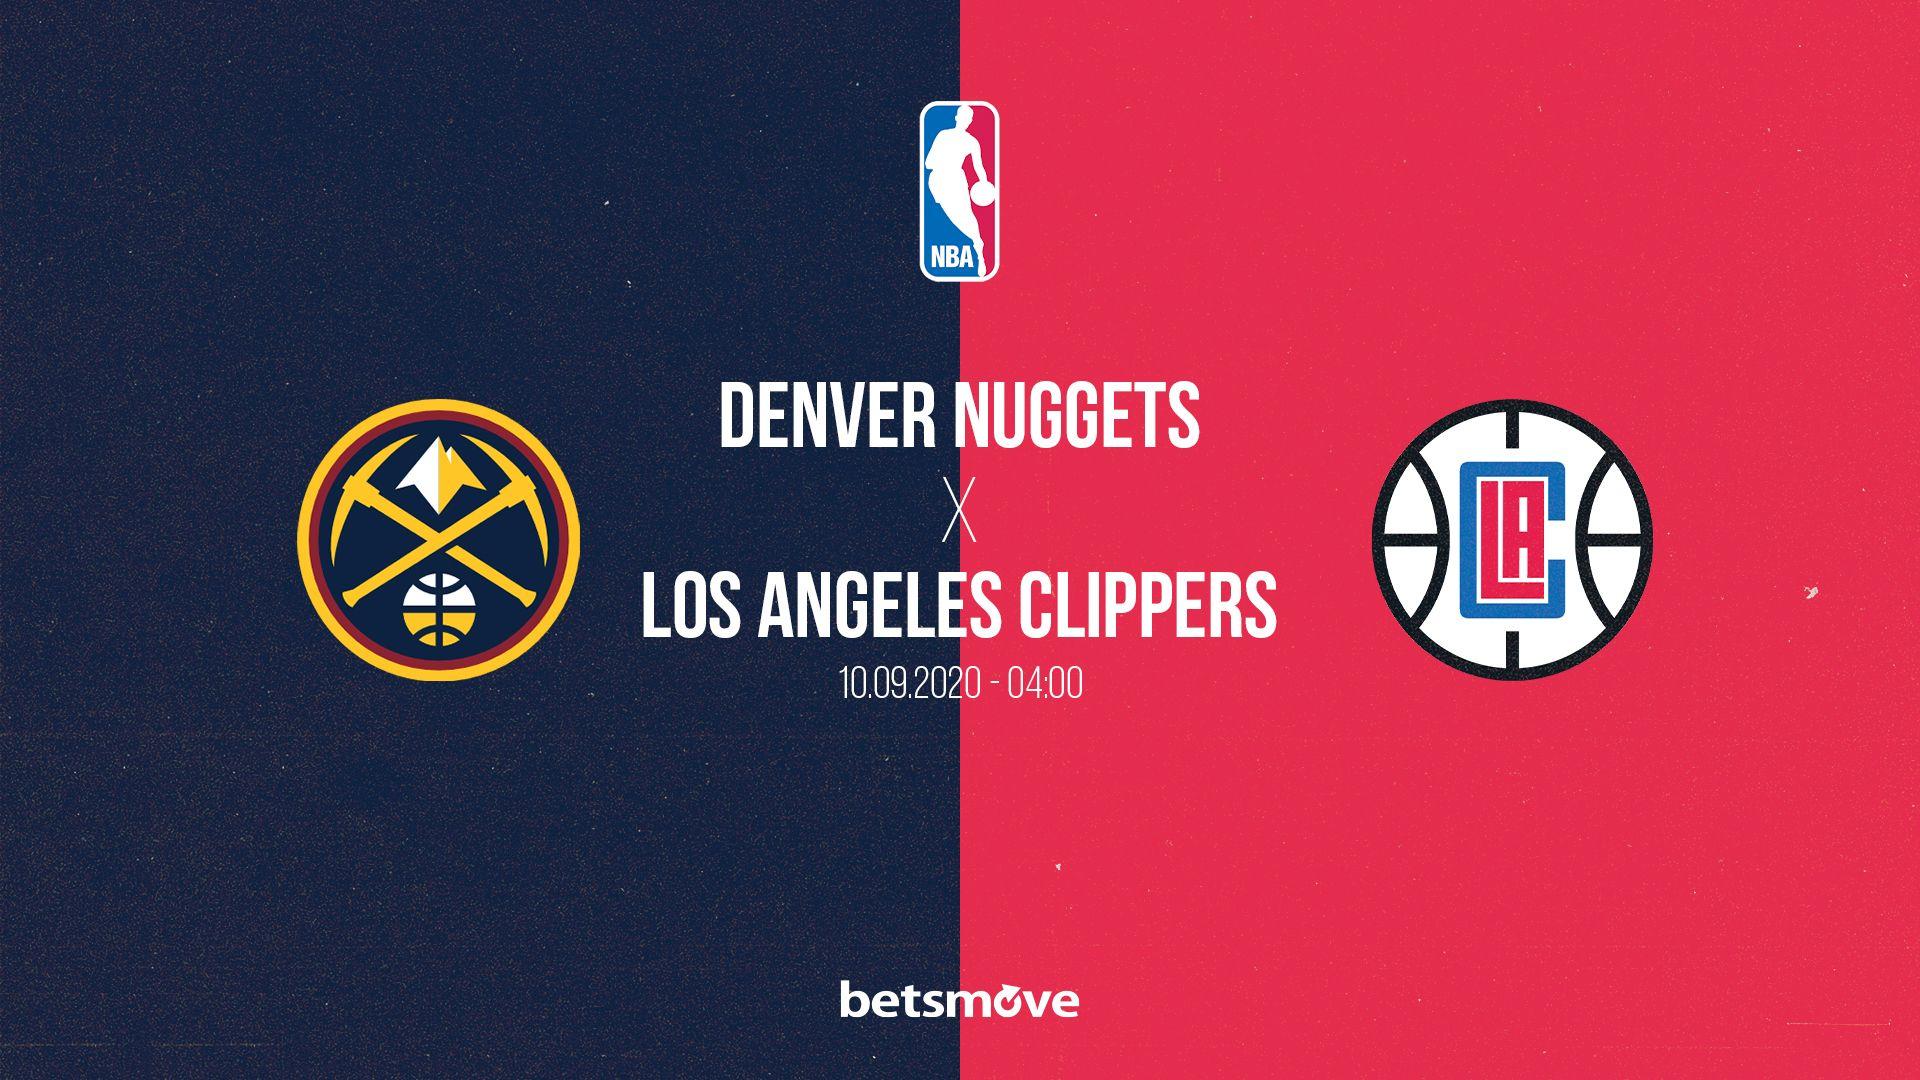 Denver Nuggets Los Angeles Clippers Canli Izle 2020 Mac Tv